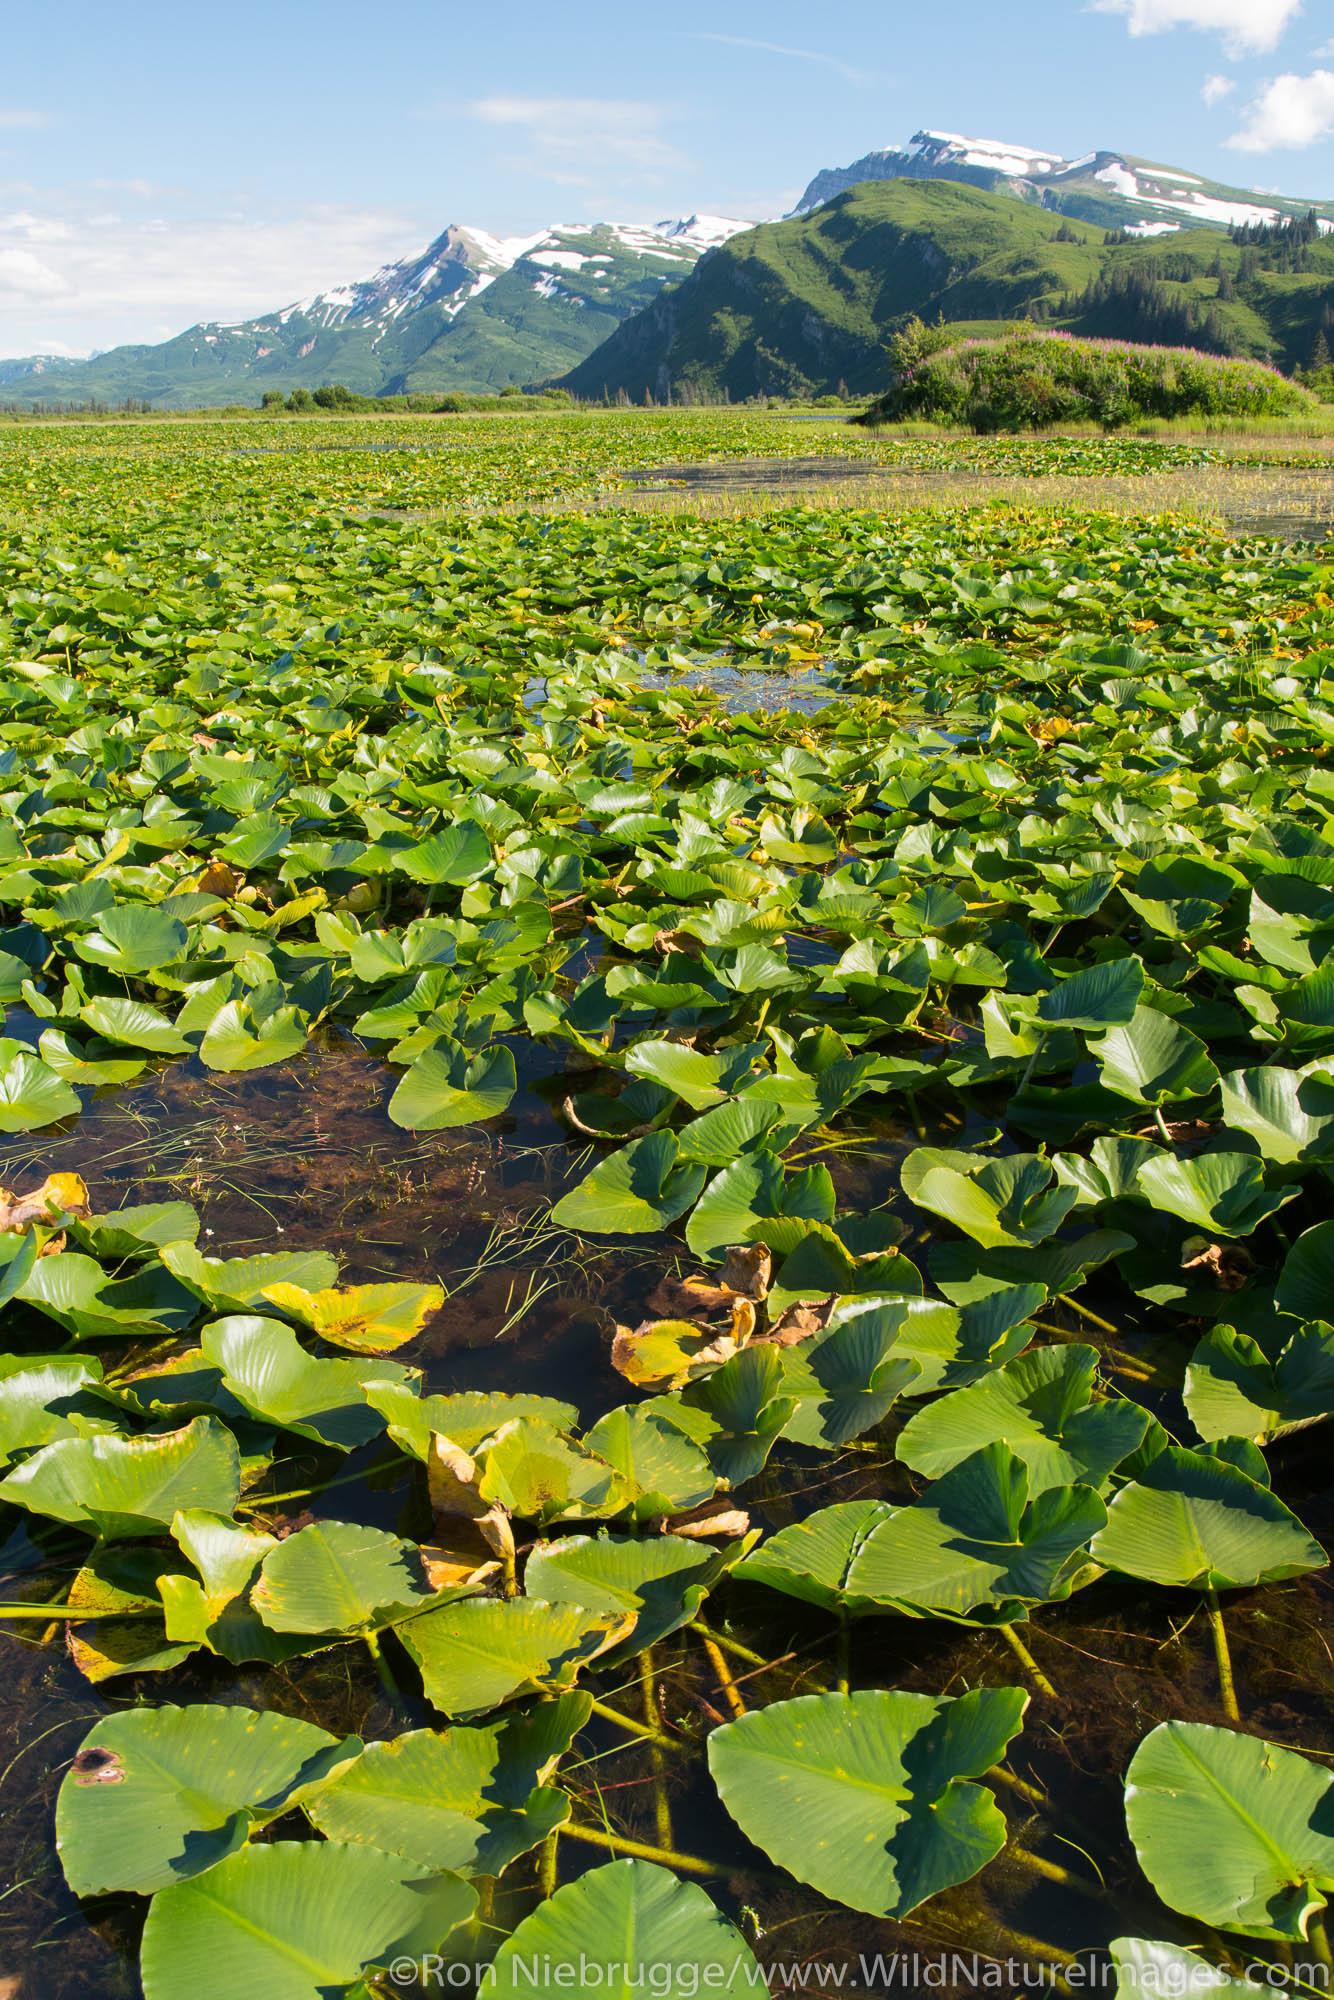 Lily pond, Lake Clark National Park, Alaska.